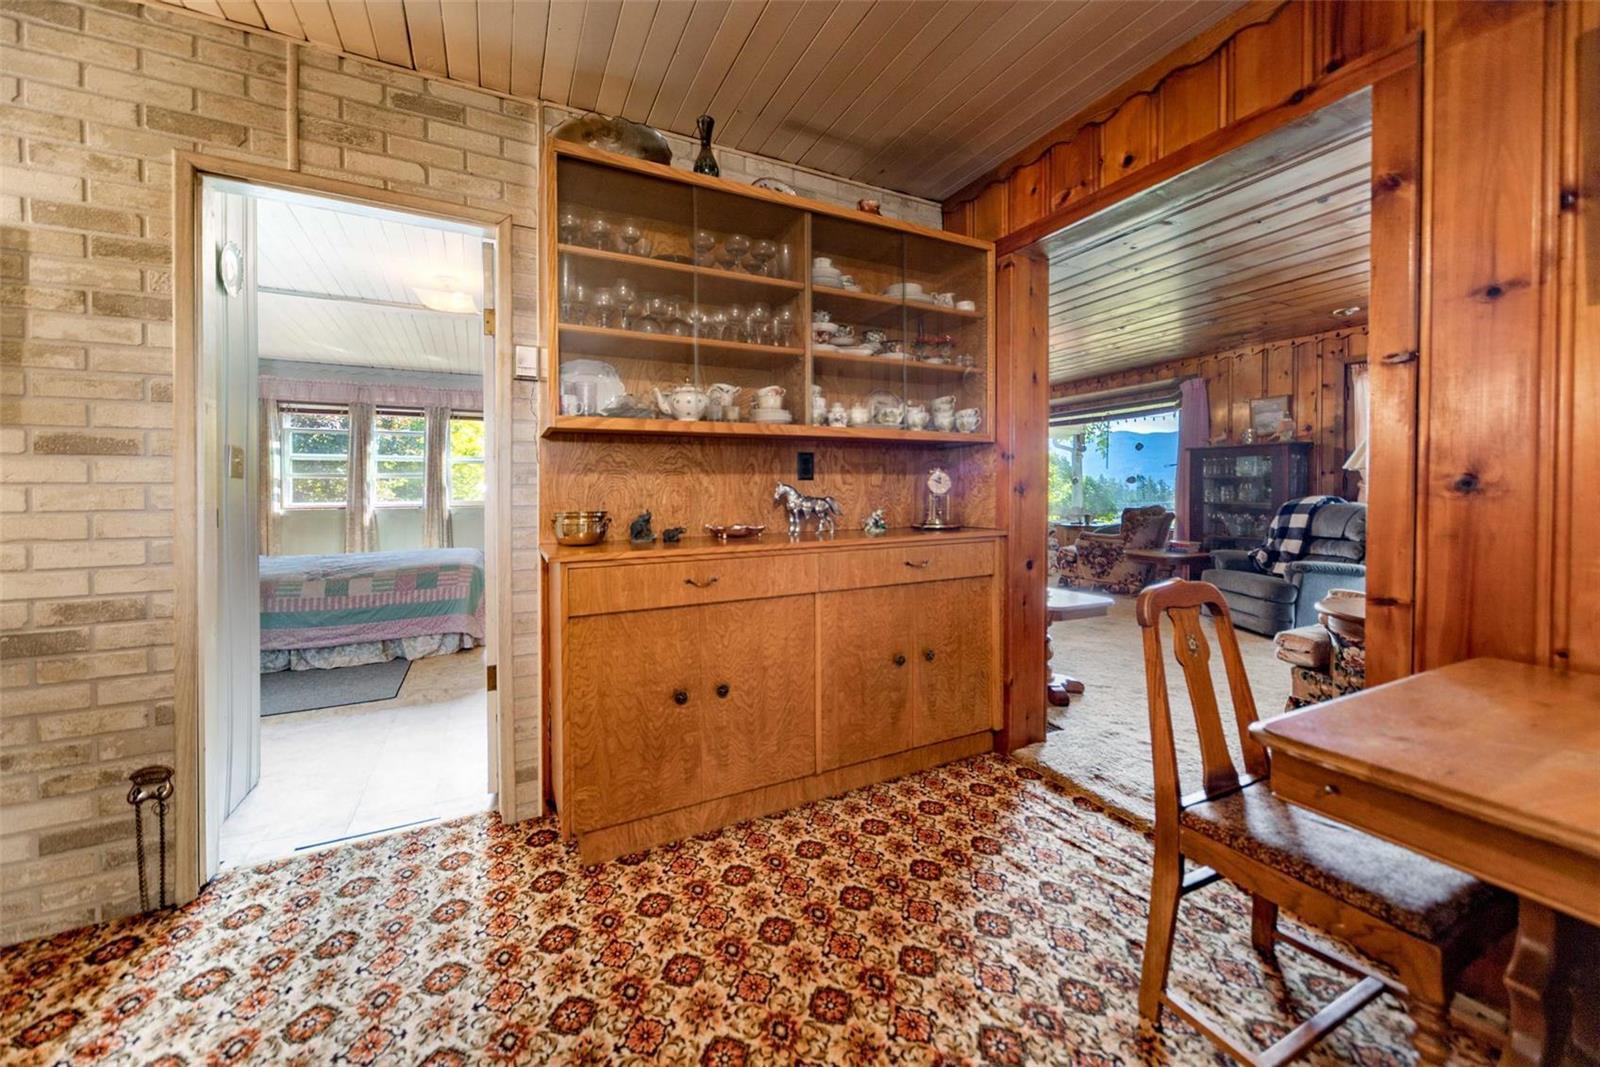 4602 Schubert Road,, Armstrong, British Columbia  V0E 1B4 - Photo 30 - 10232683